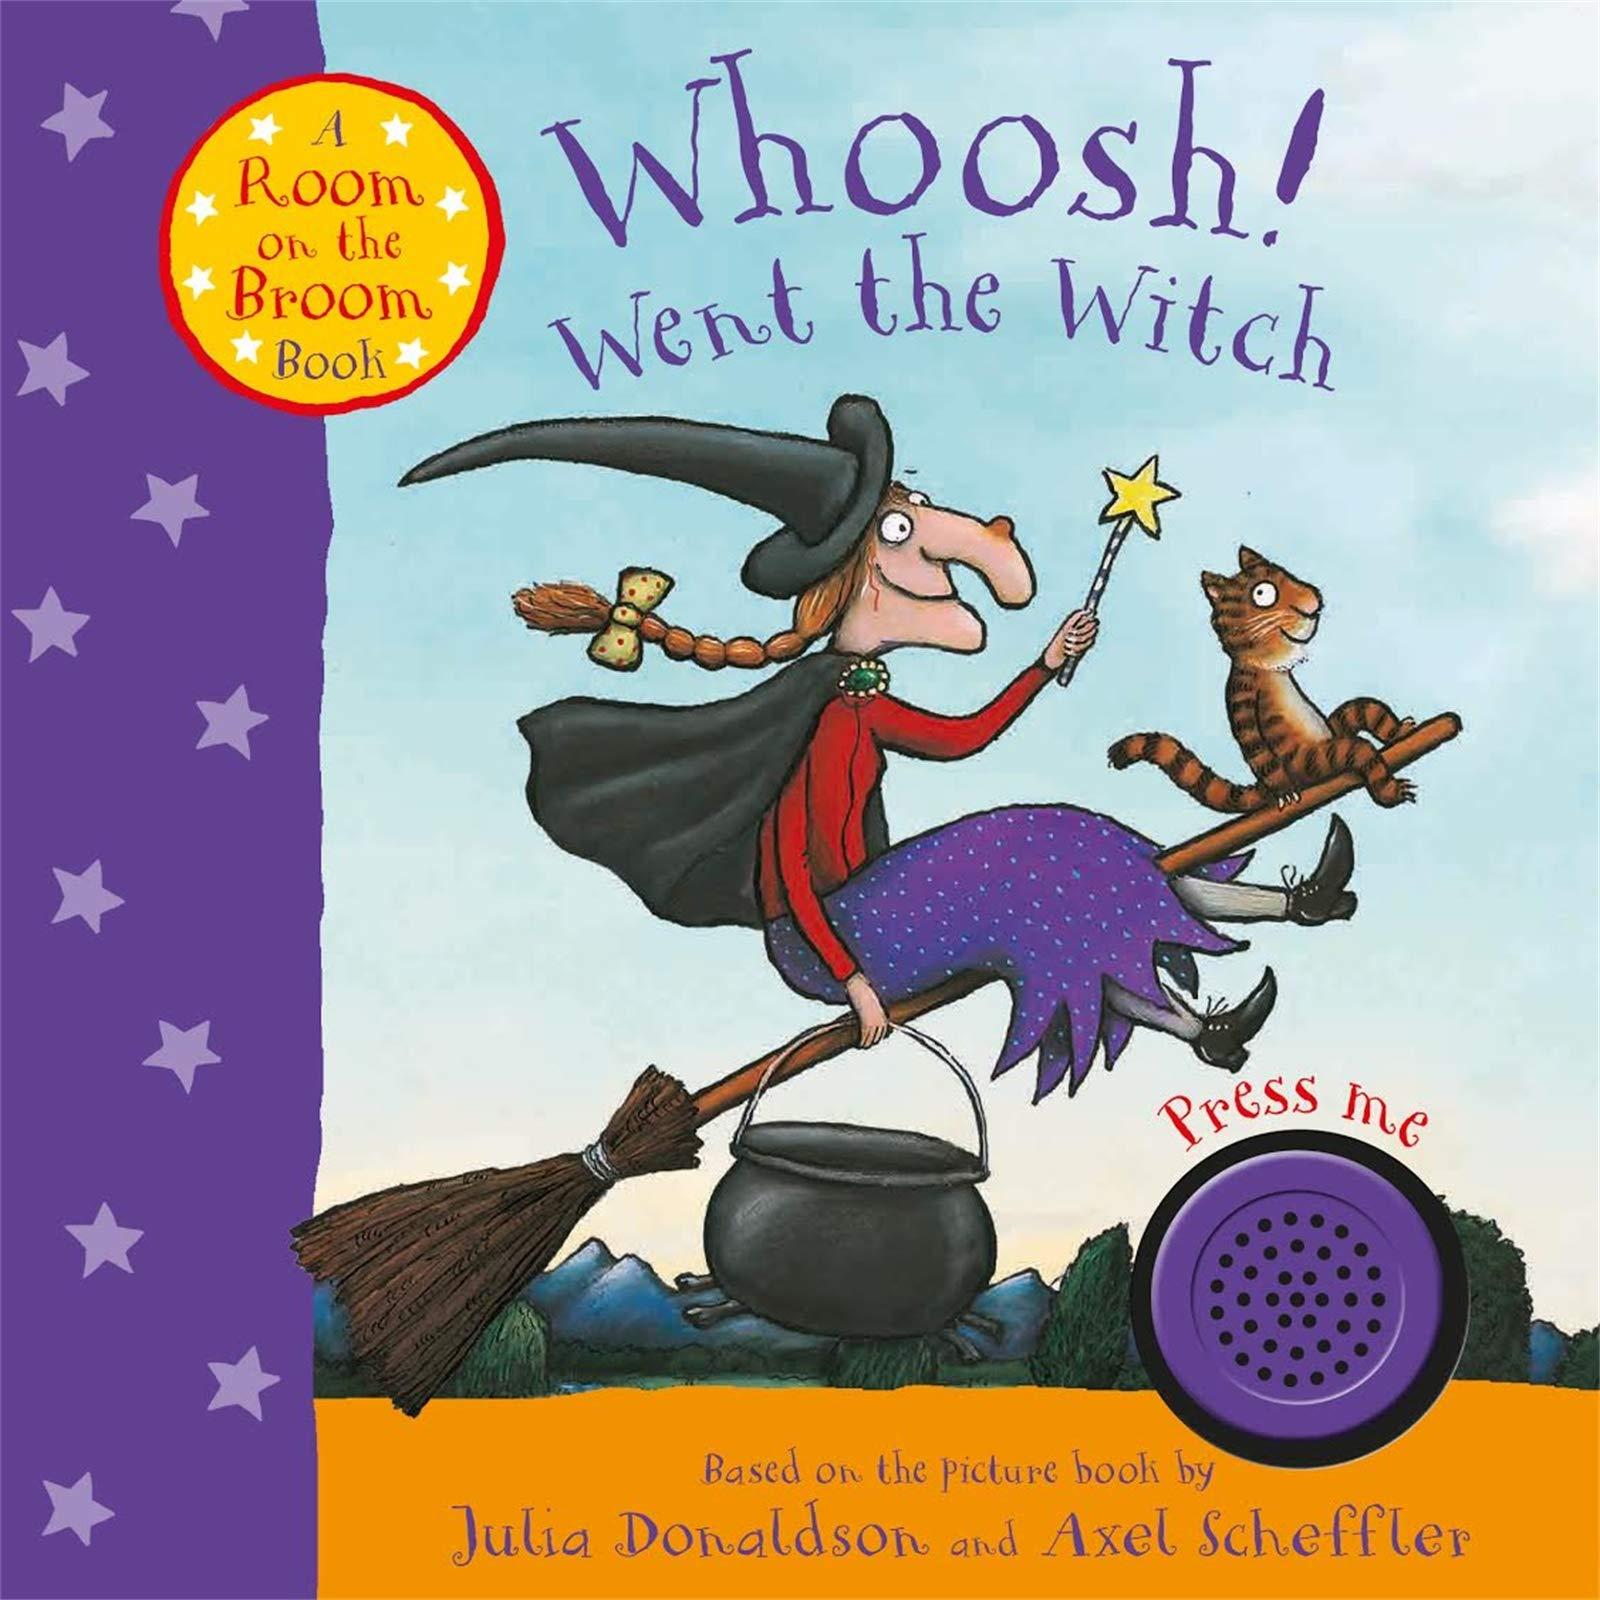 Donaldson, J: Whoosh! Went the Witch: A Room on the Broom Bo: Amazon.es: Donaldson, Julia, Scheffler, Axel: Libros en idiomas extranjeros